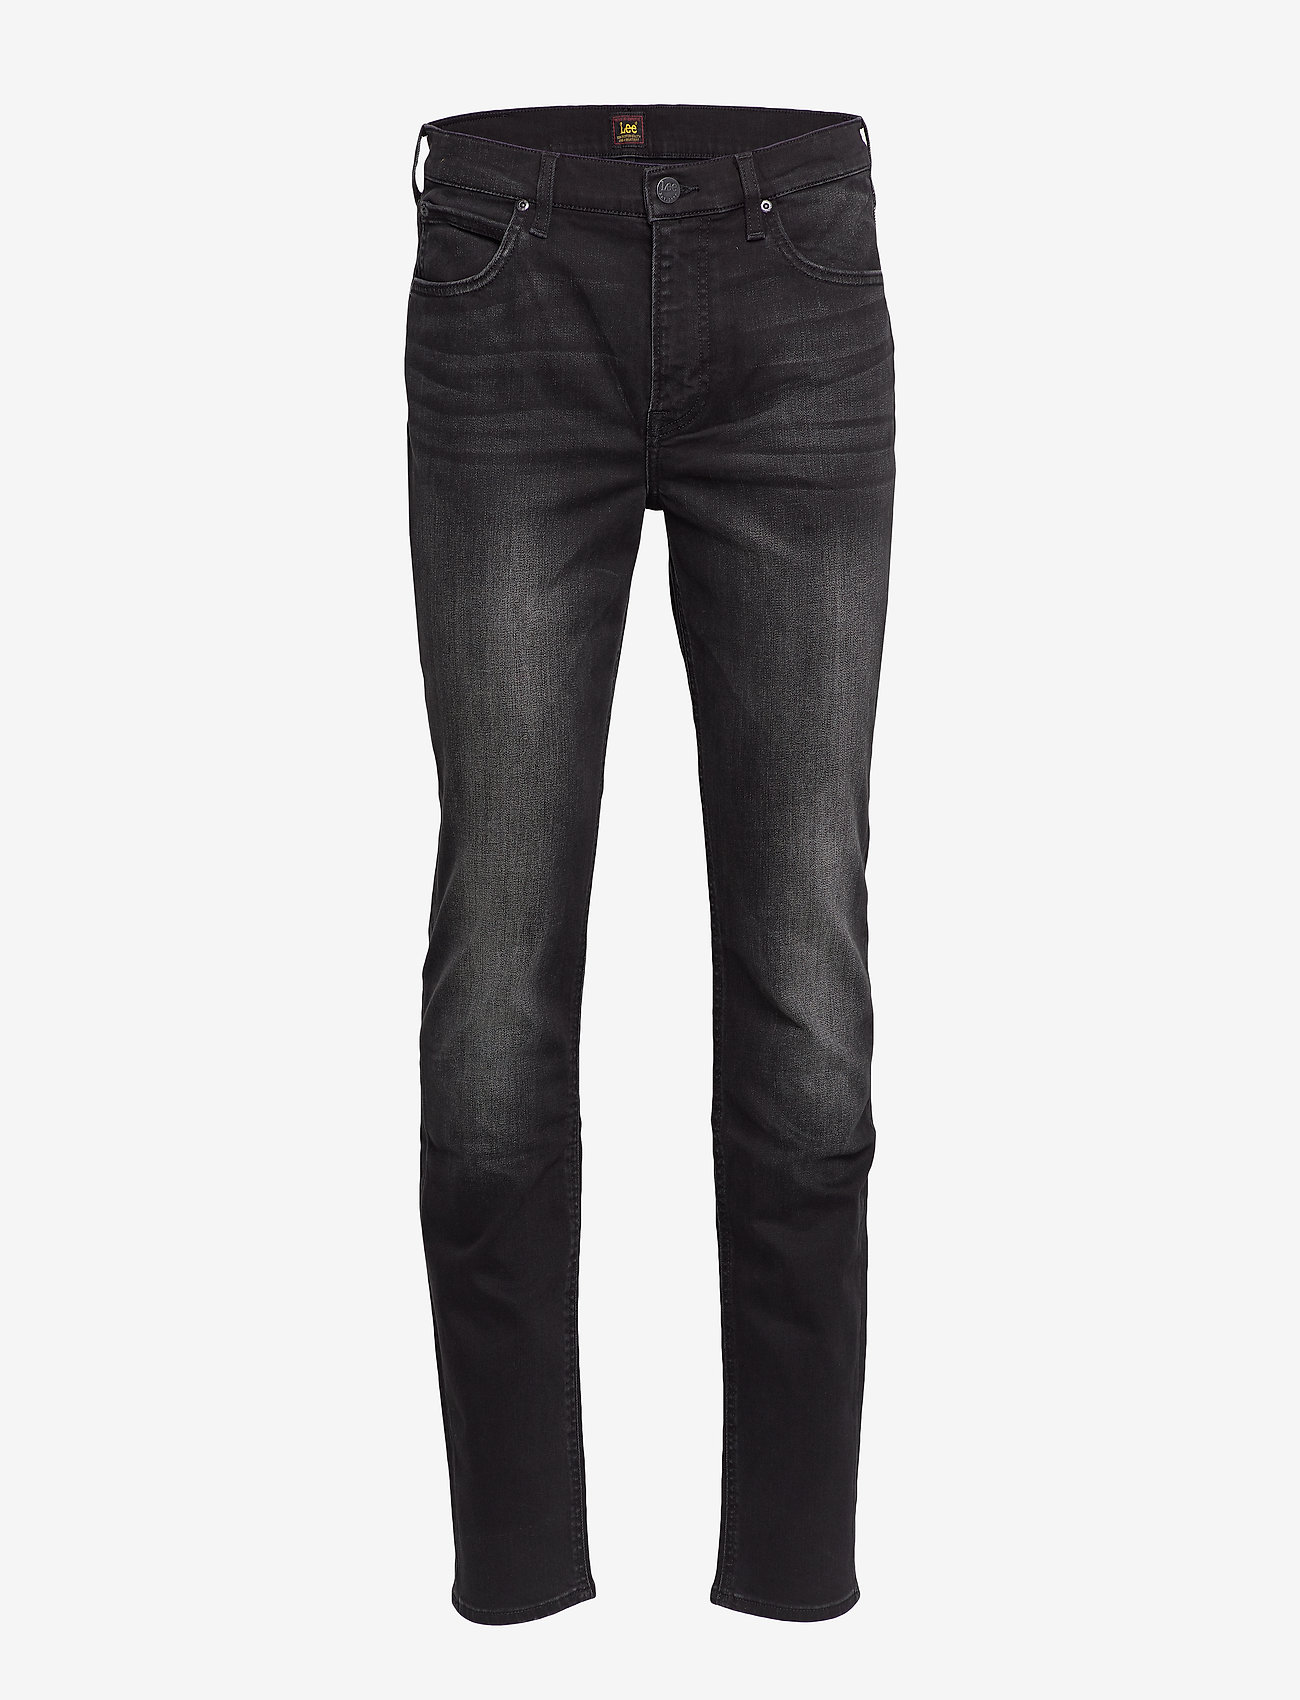 Lee Jeans - AUSTIN - regular jeans - moto black - 1